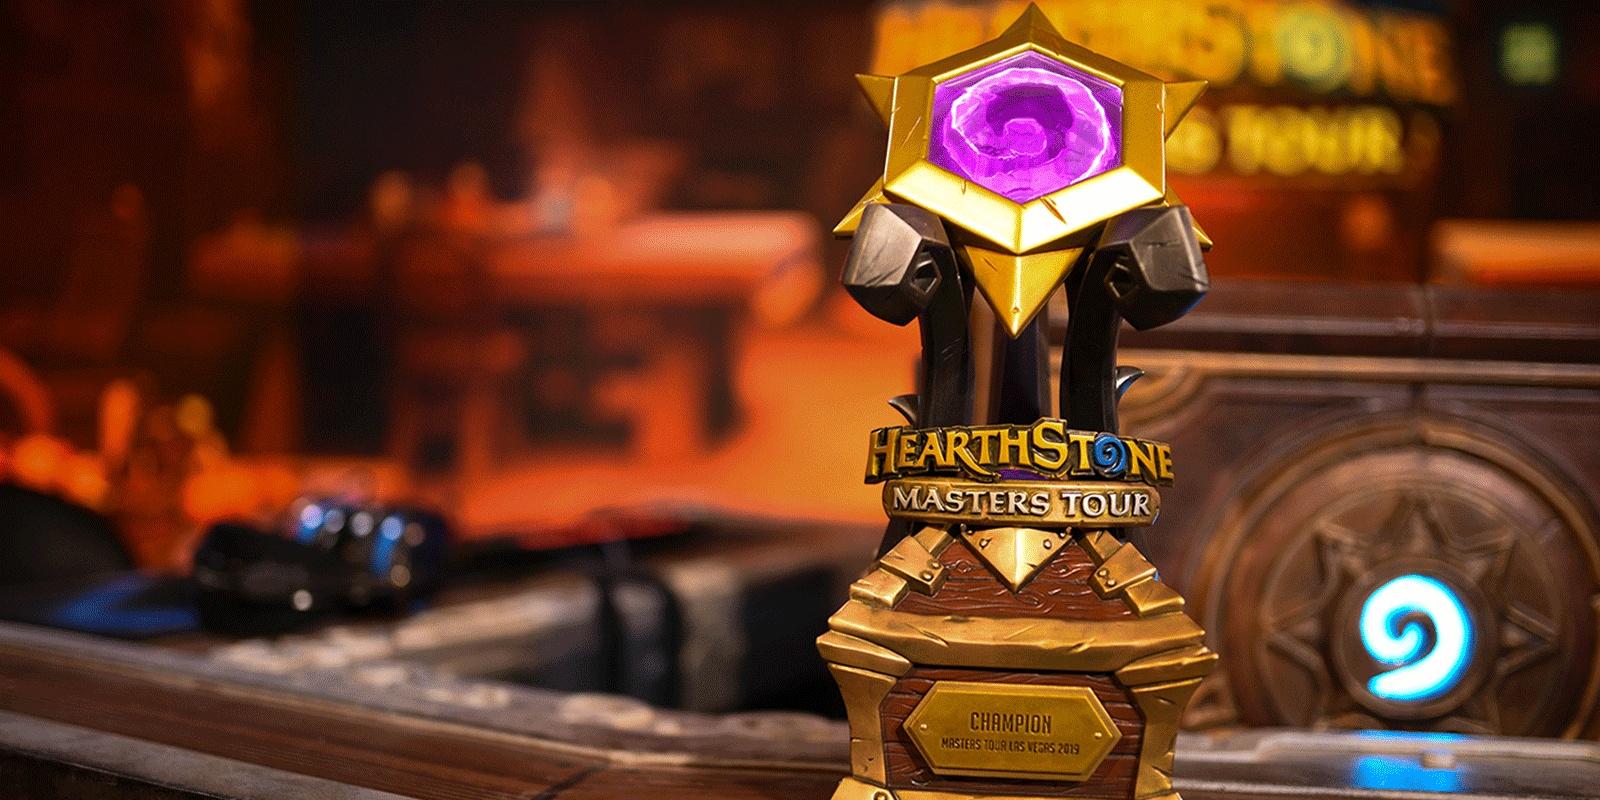 Из-за коронавируса турнир Hearthstone Masters Tour Los Angeles переместится в онлайн